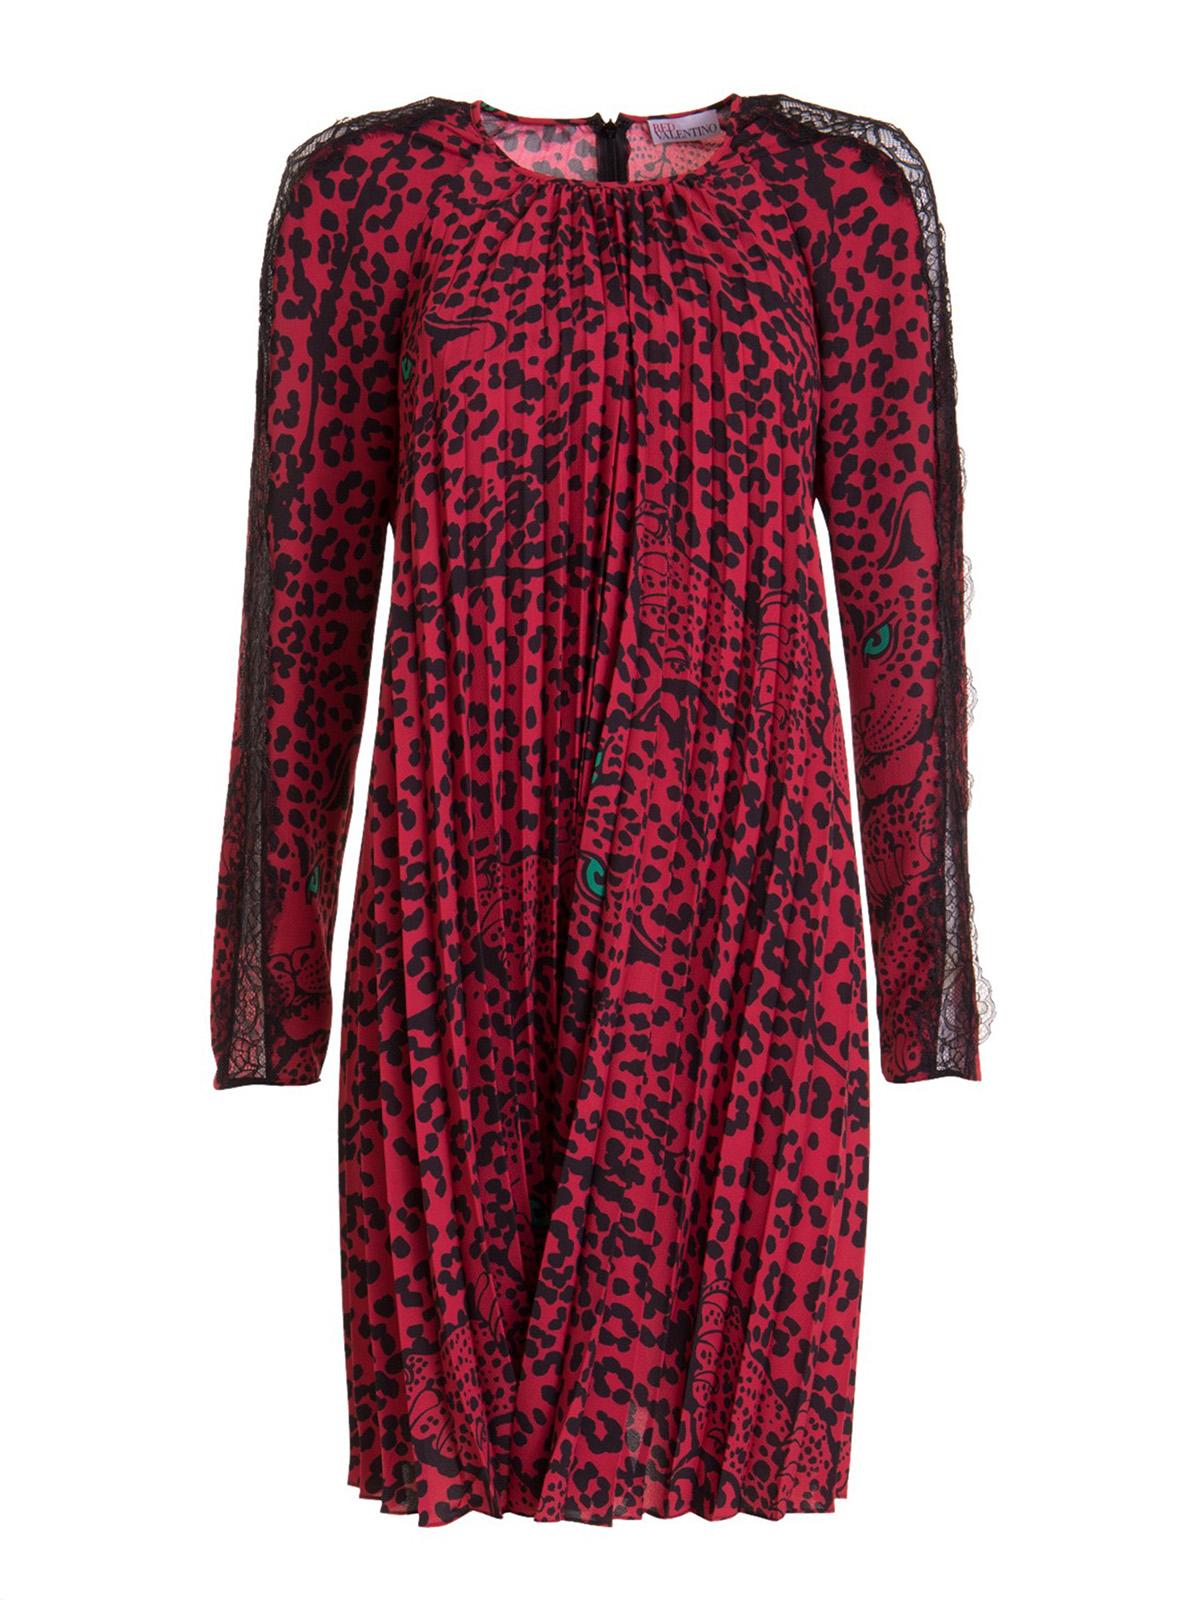 Red Valentino LEO PANTHER PRINT MAROCAINE DRESS